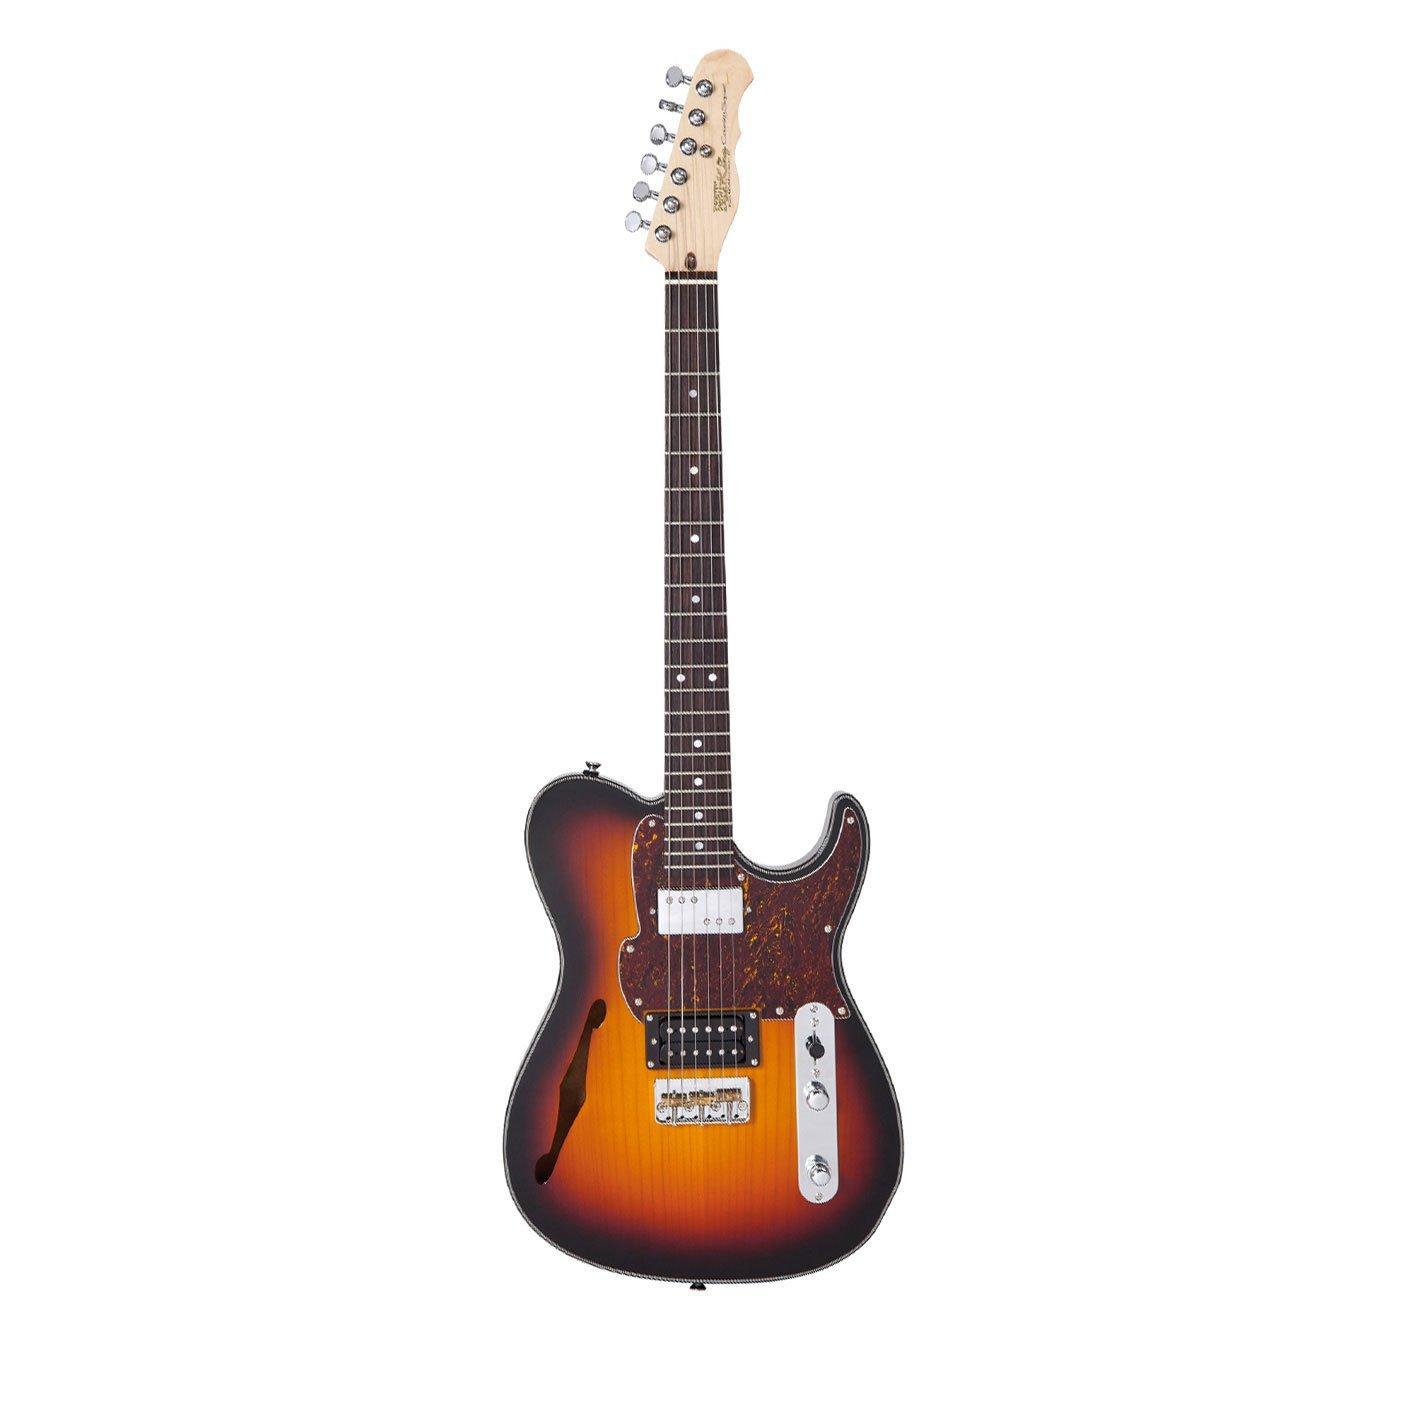 fret-king Country Squire semitono guitarra eléctrica - ráfaga de original Classic: Amazon.es: Instrumentos musicales